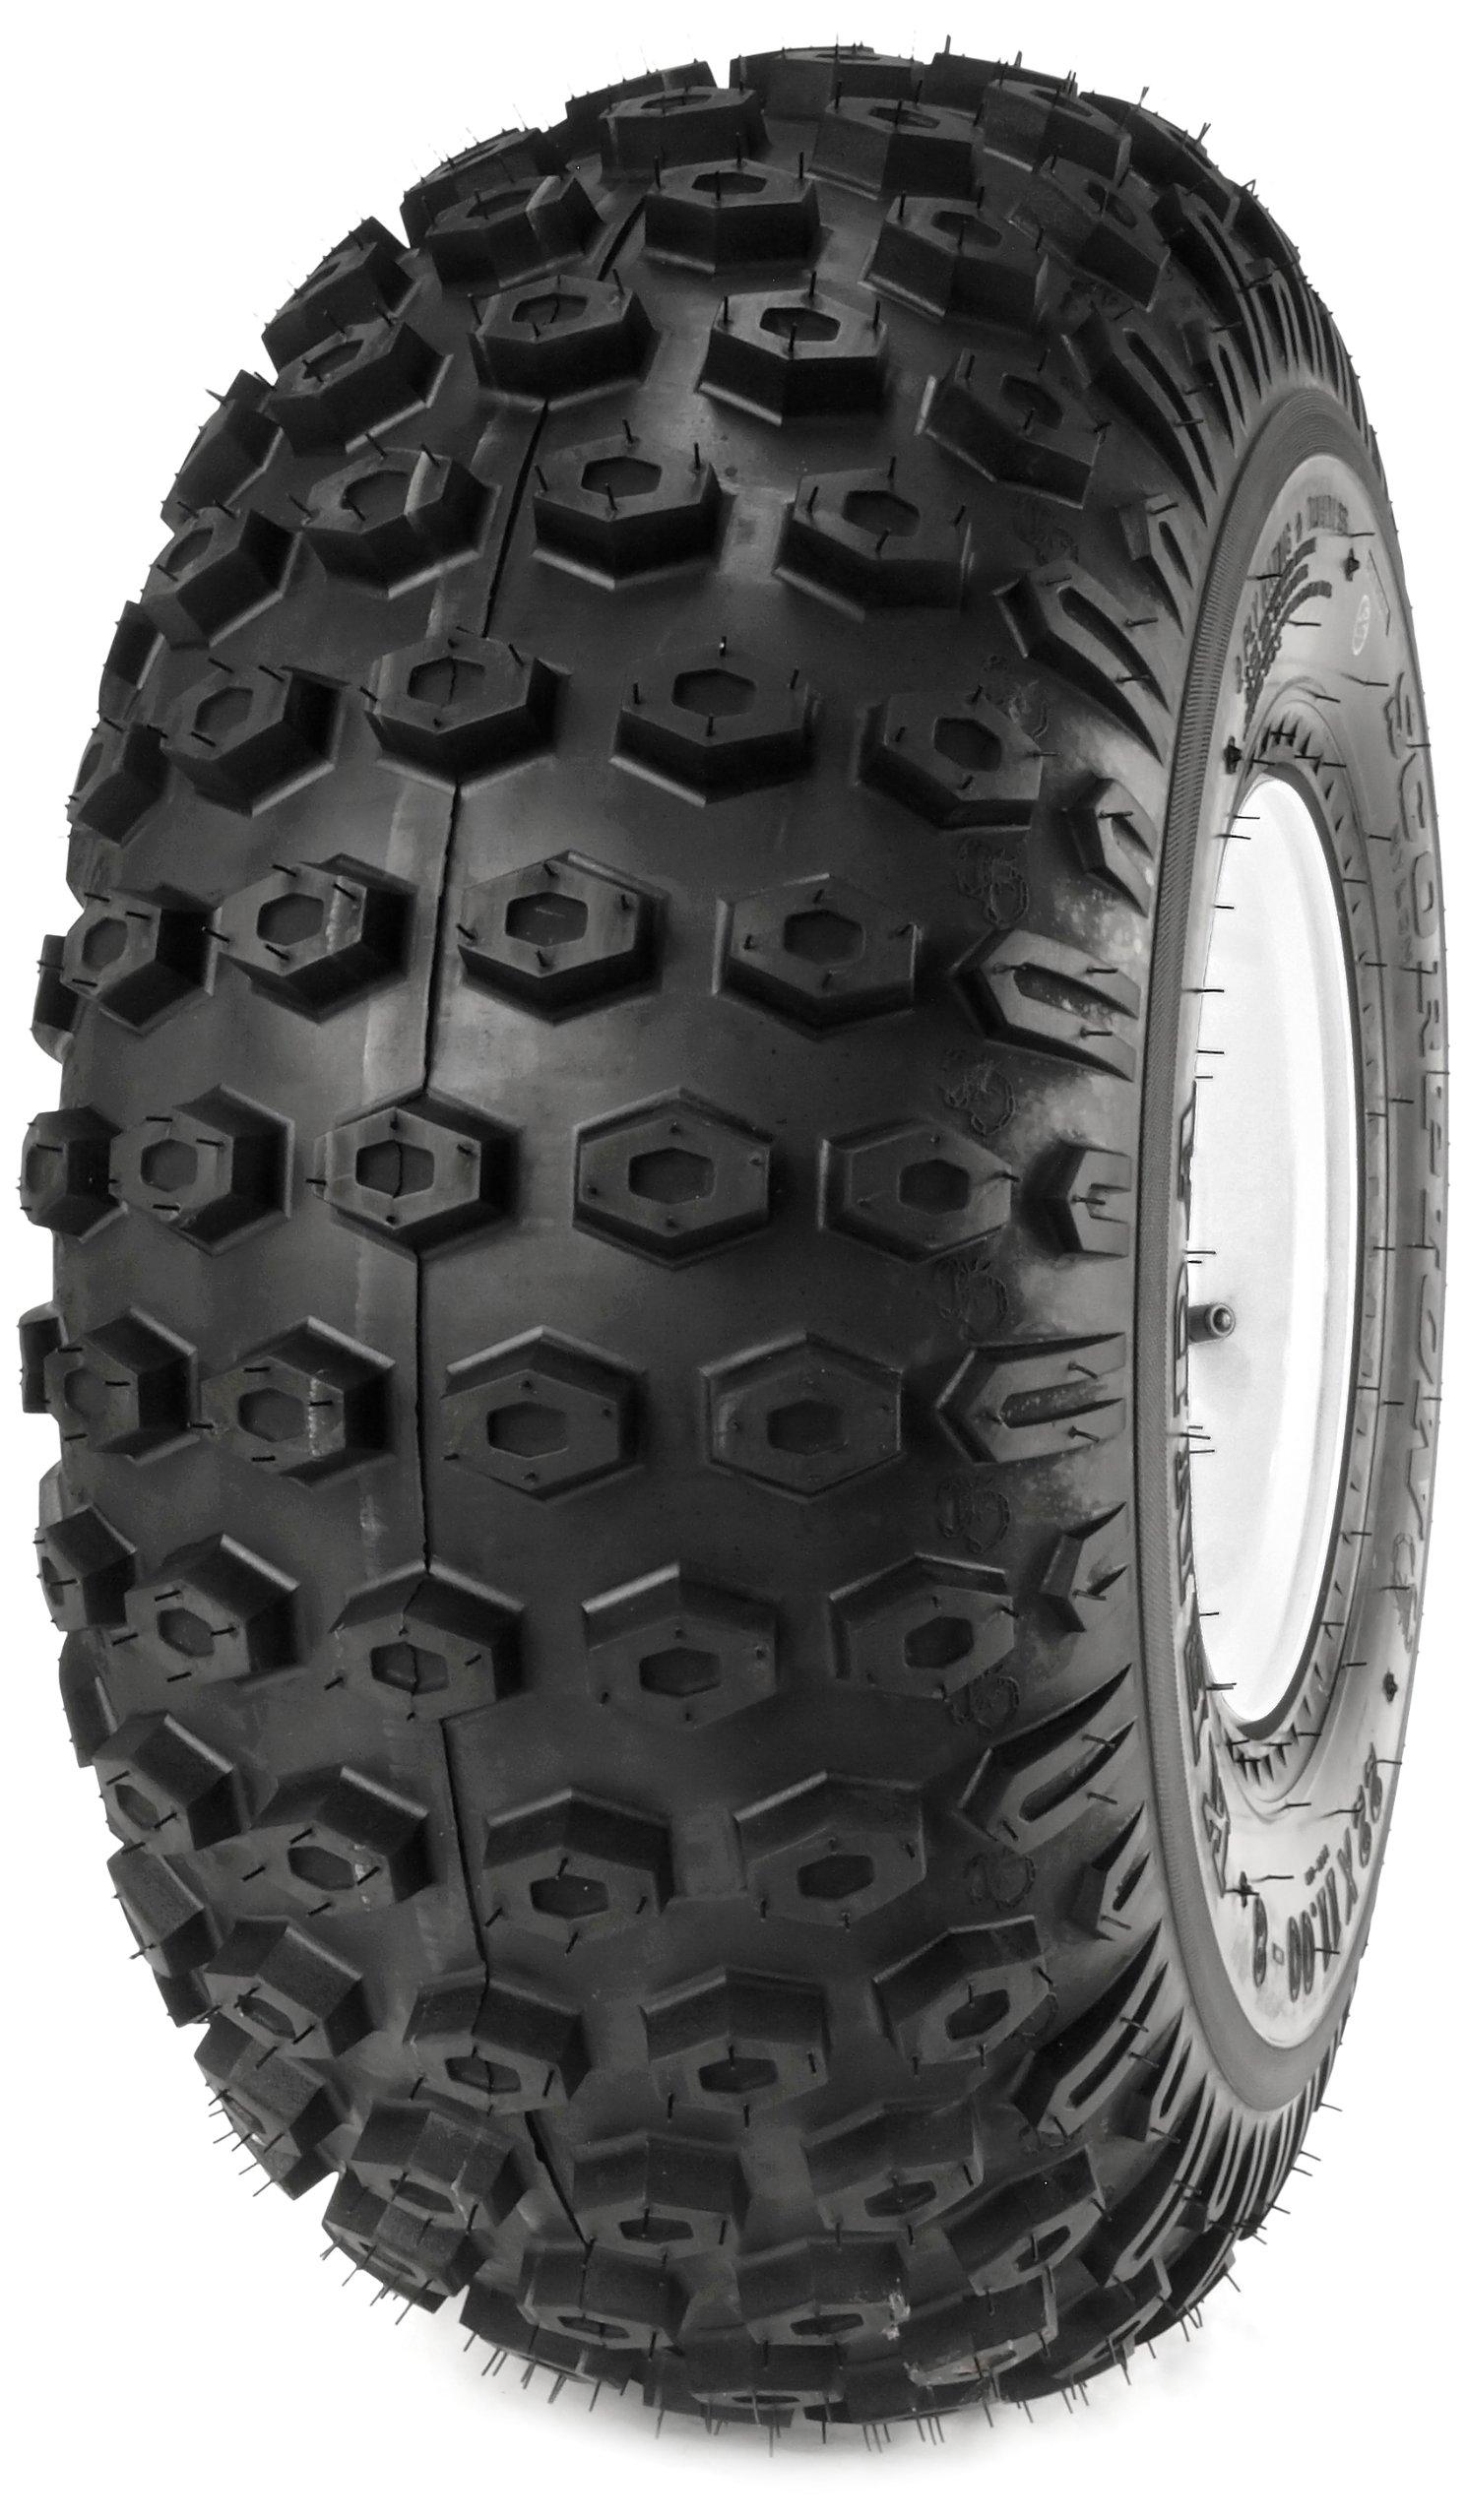 Kenda Scorpion K290 ATV Tire - 22X11-8